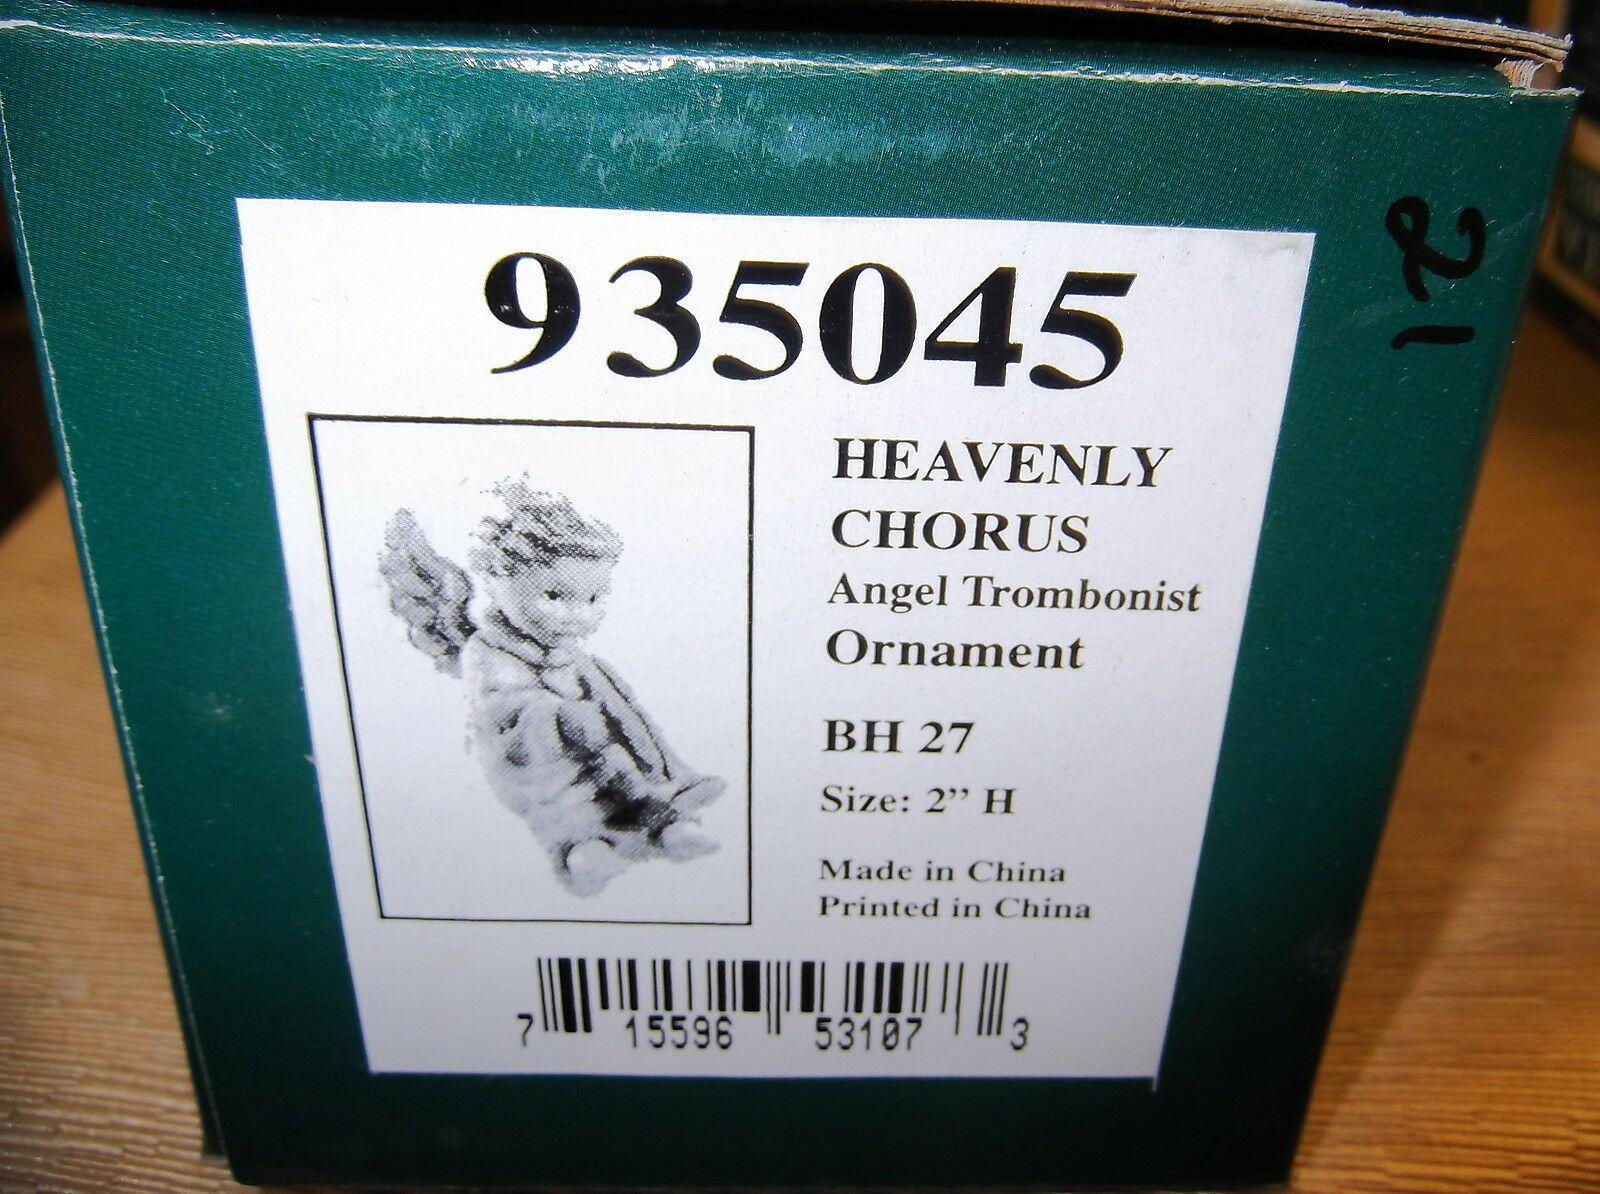 Goebel Berta Hummel Heavenly Chorus Angel Trombonist Ornament #935045